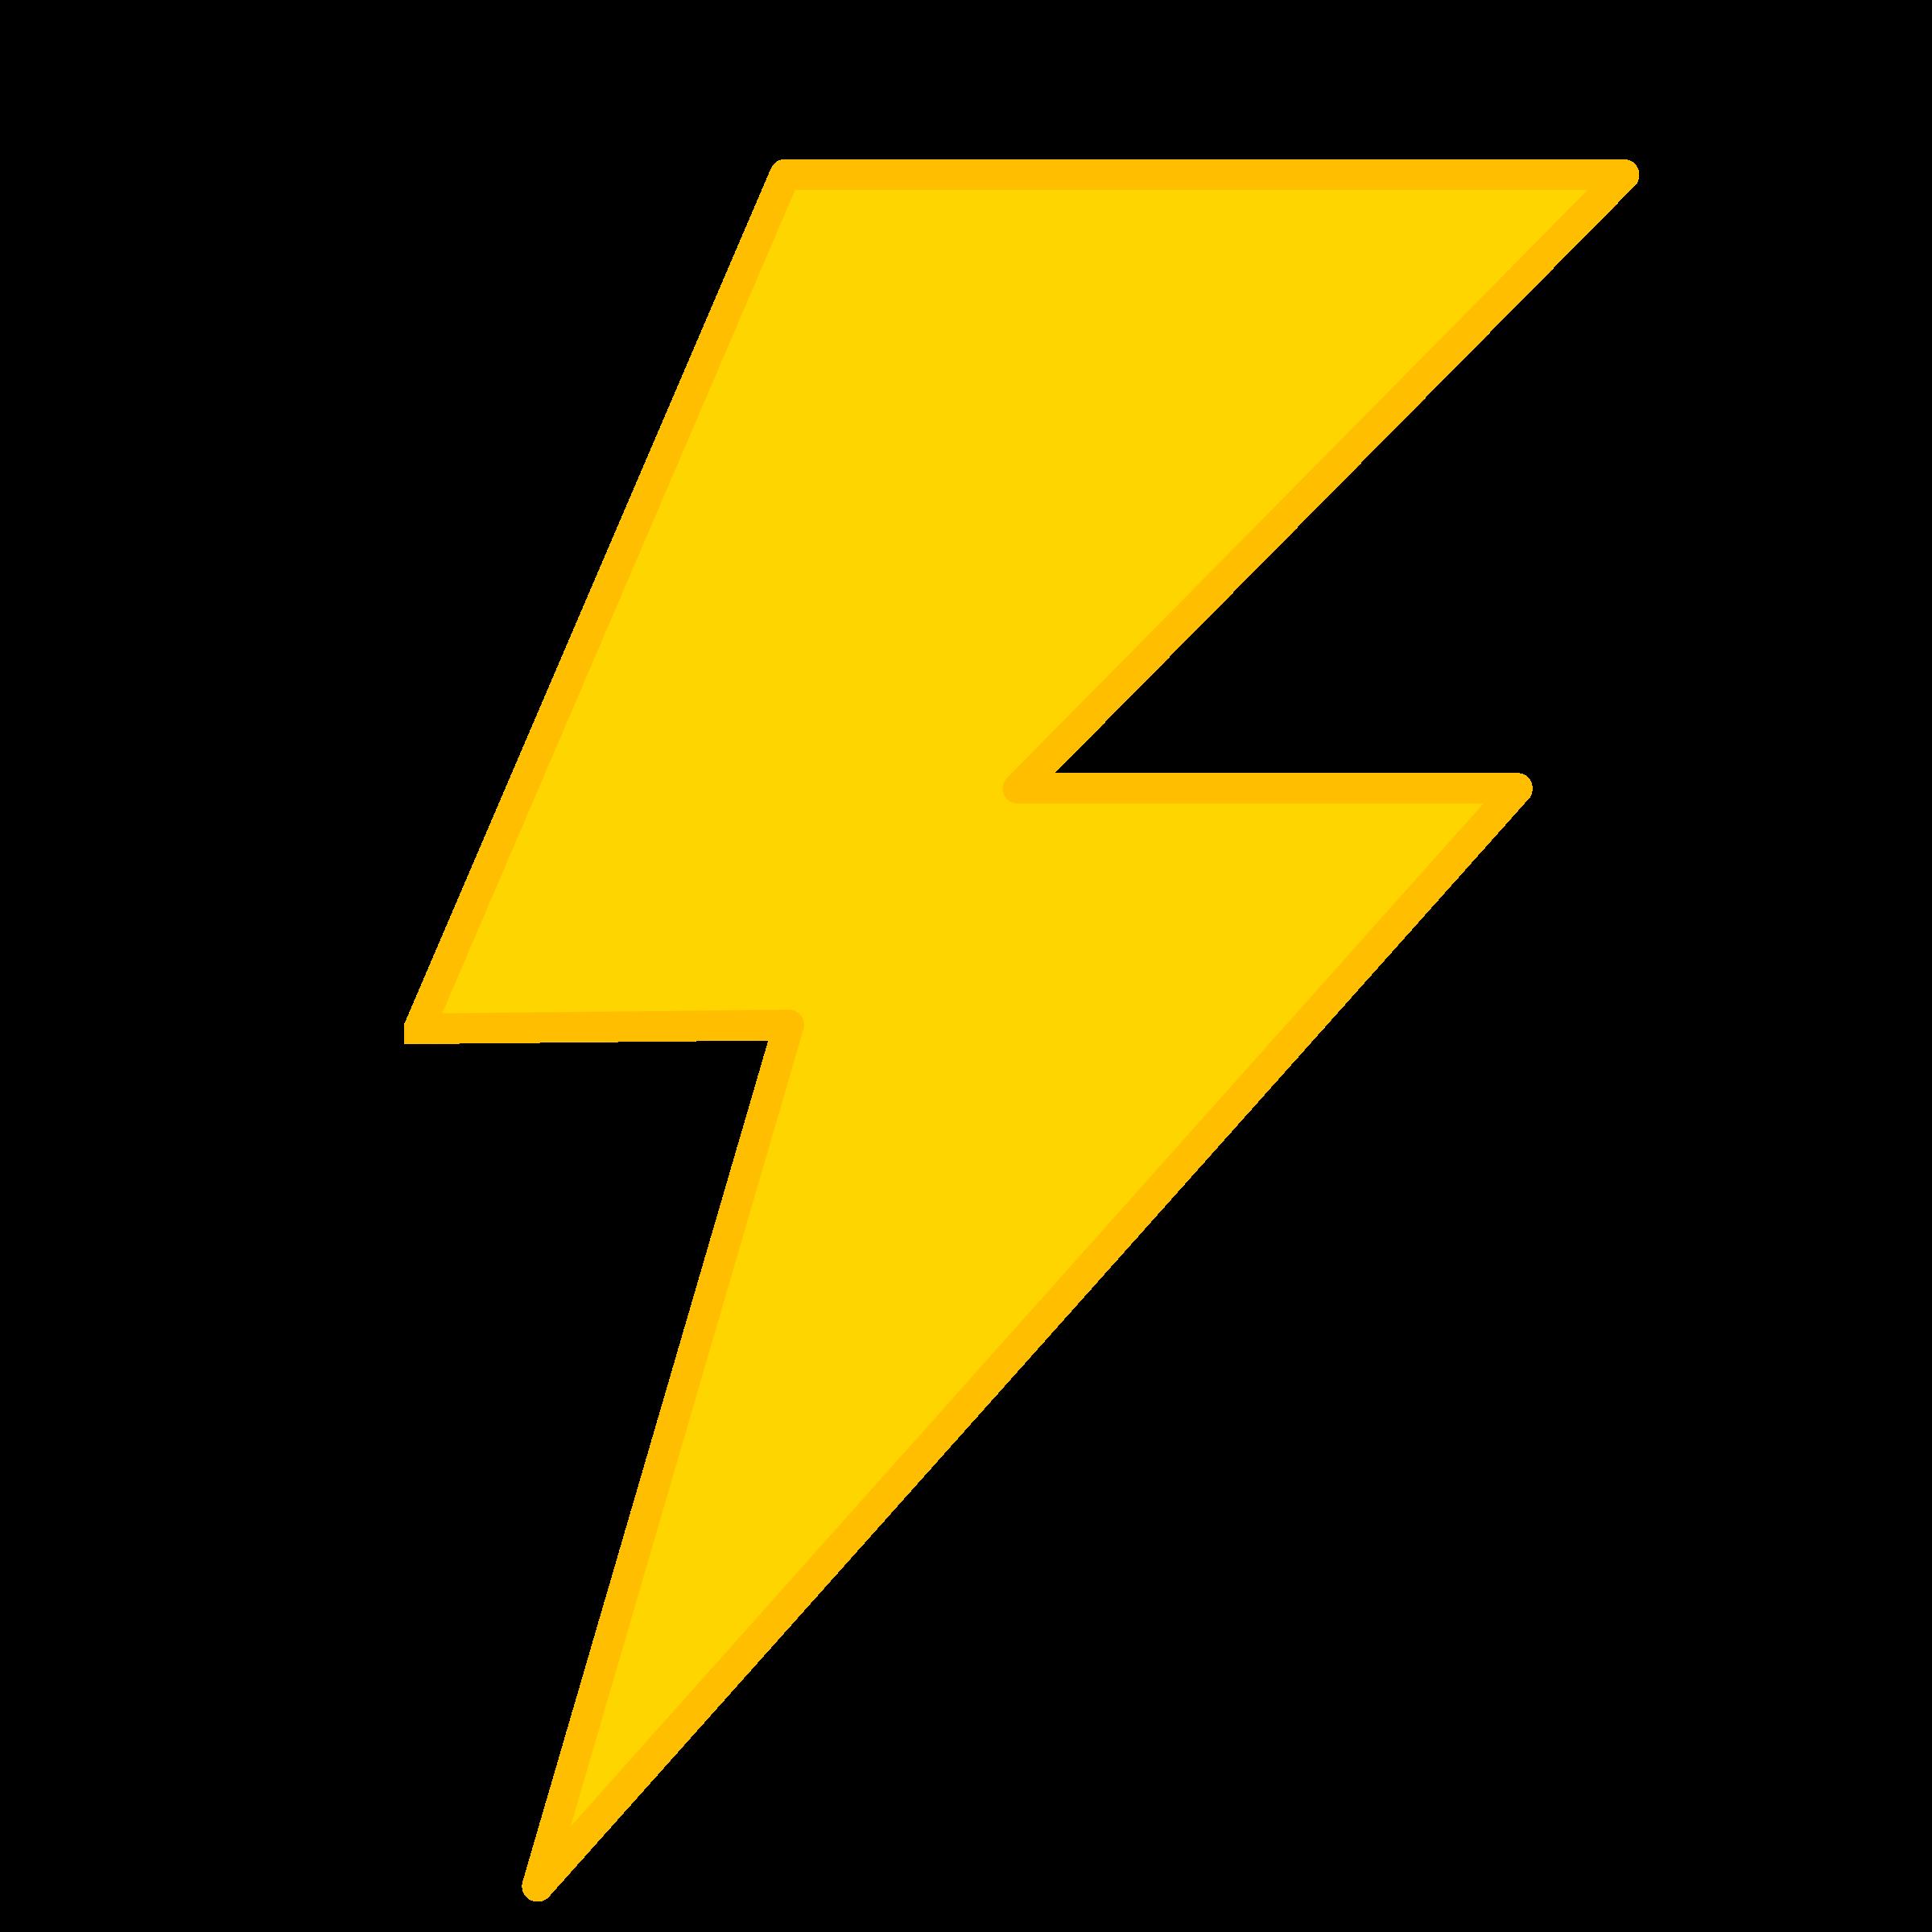 Lightning png transparentpng . Phone clipart yellow